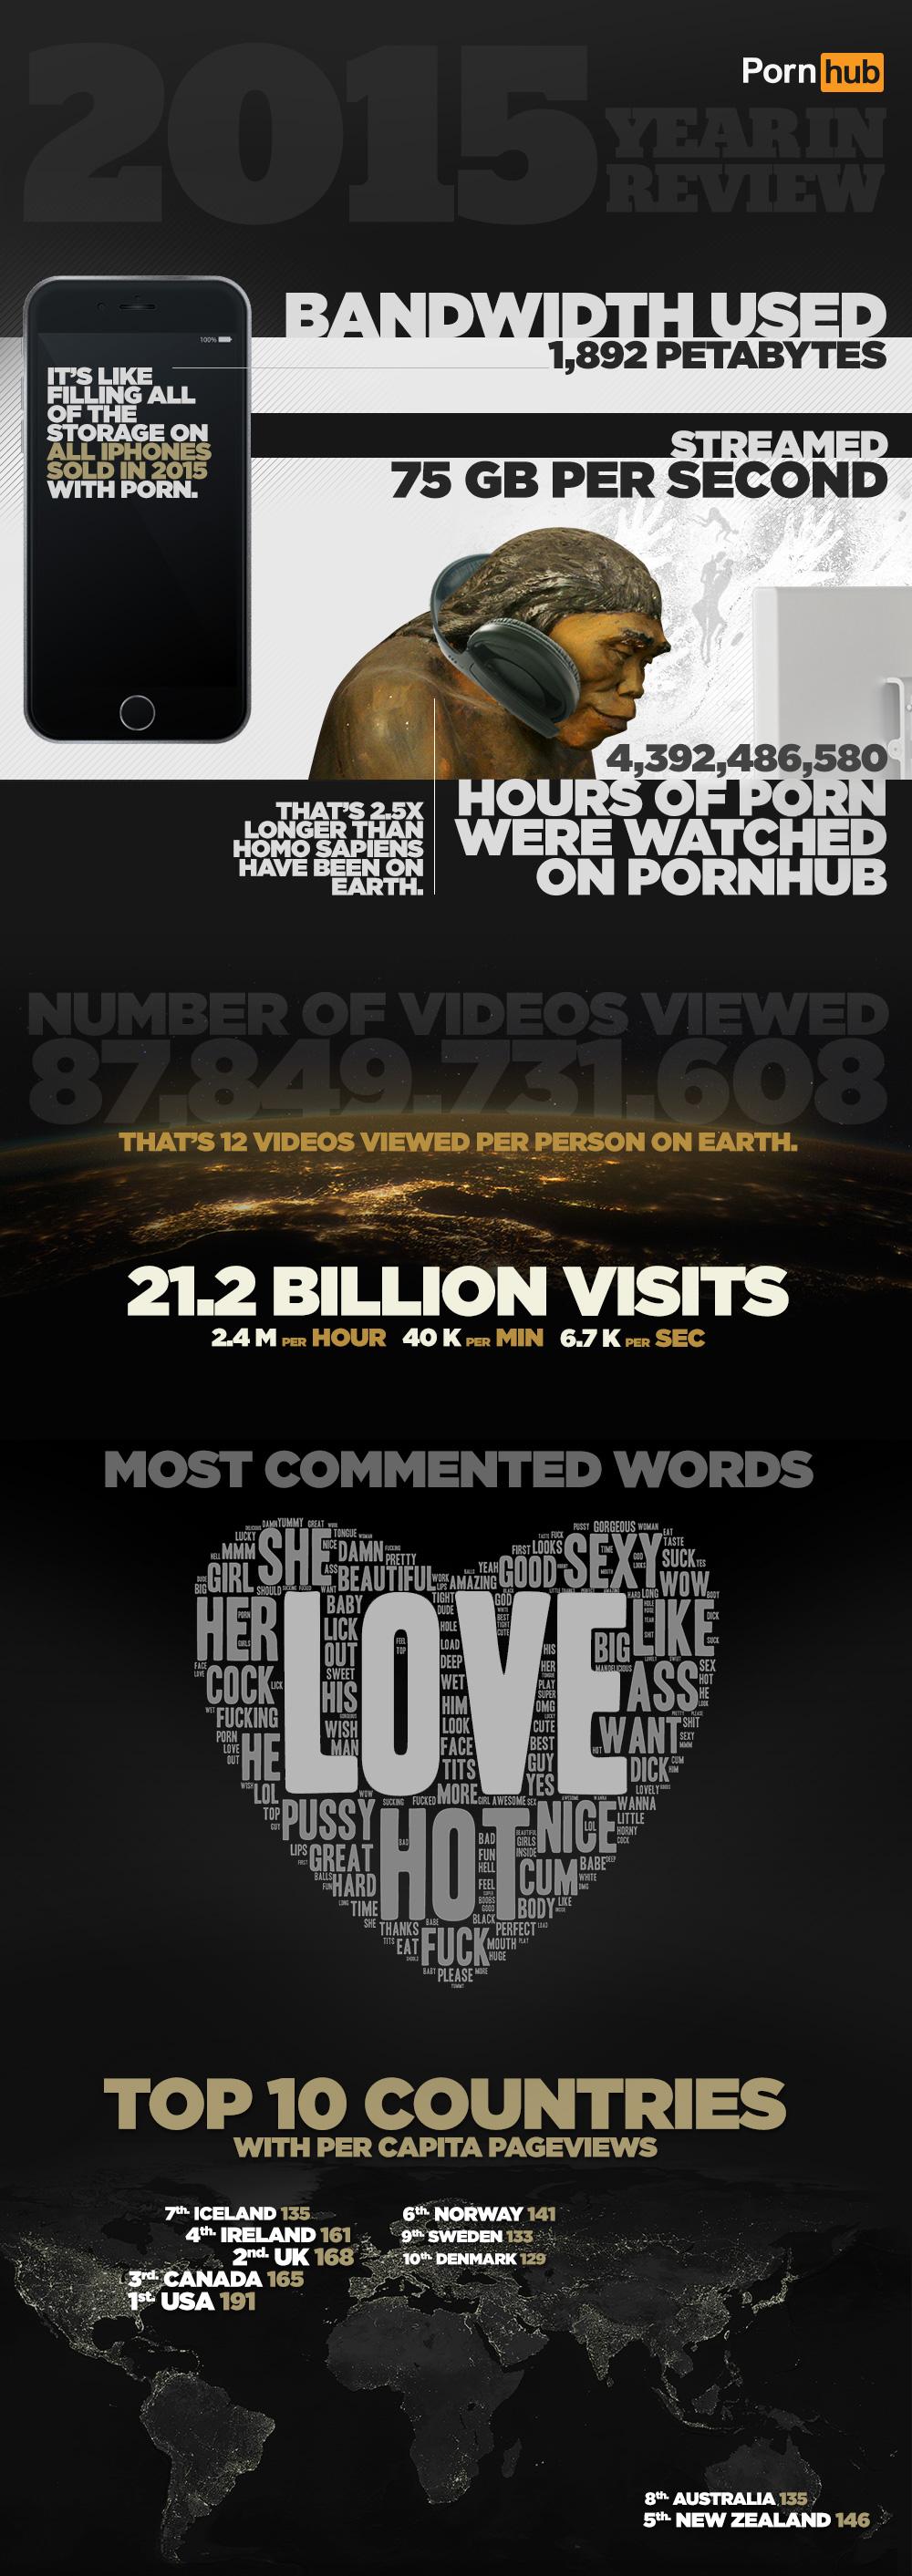 Statistika ogleda pornografije na Pornhubu v letu 2015